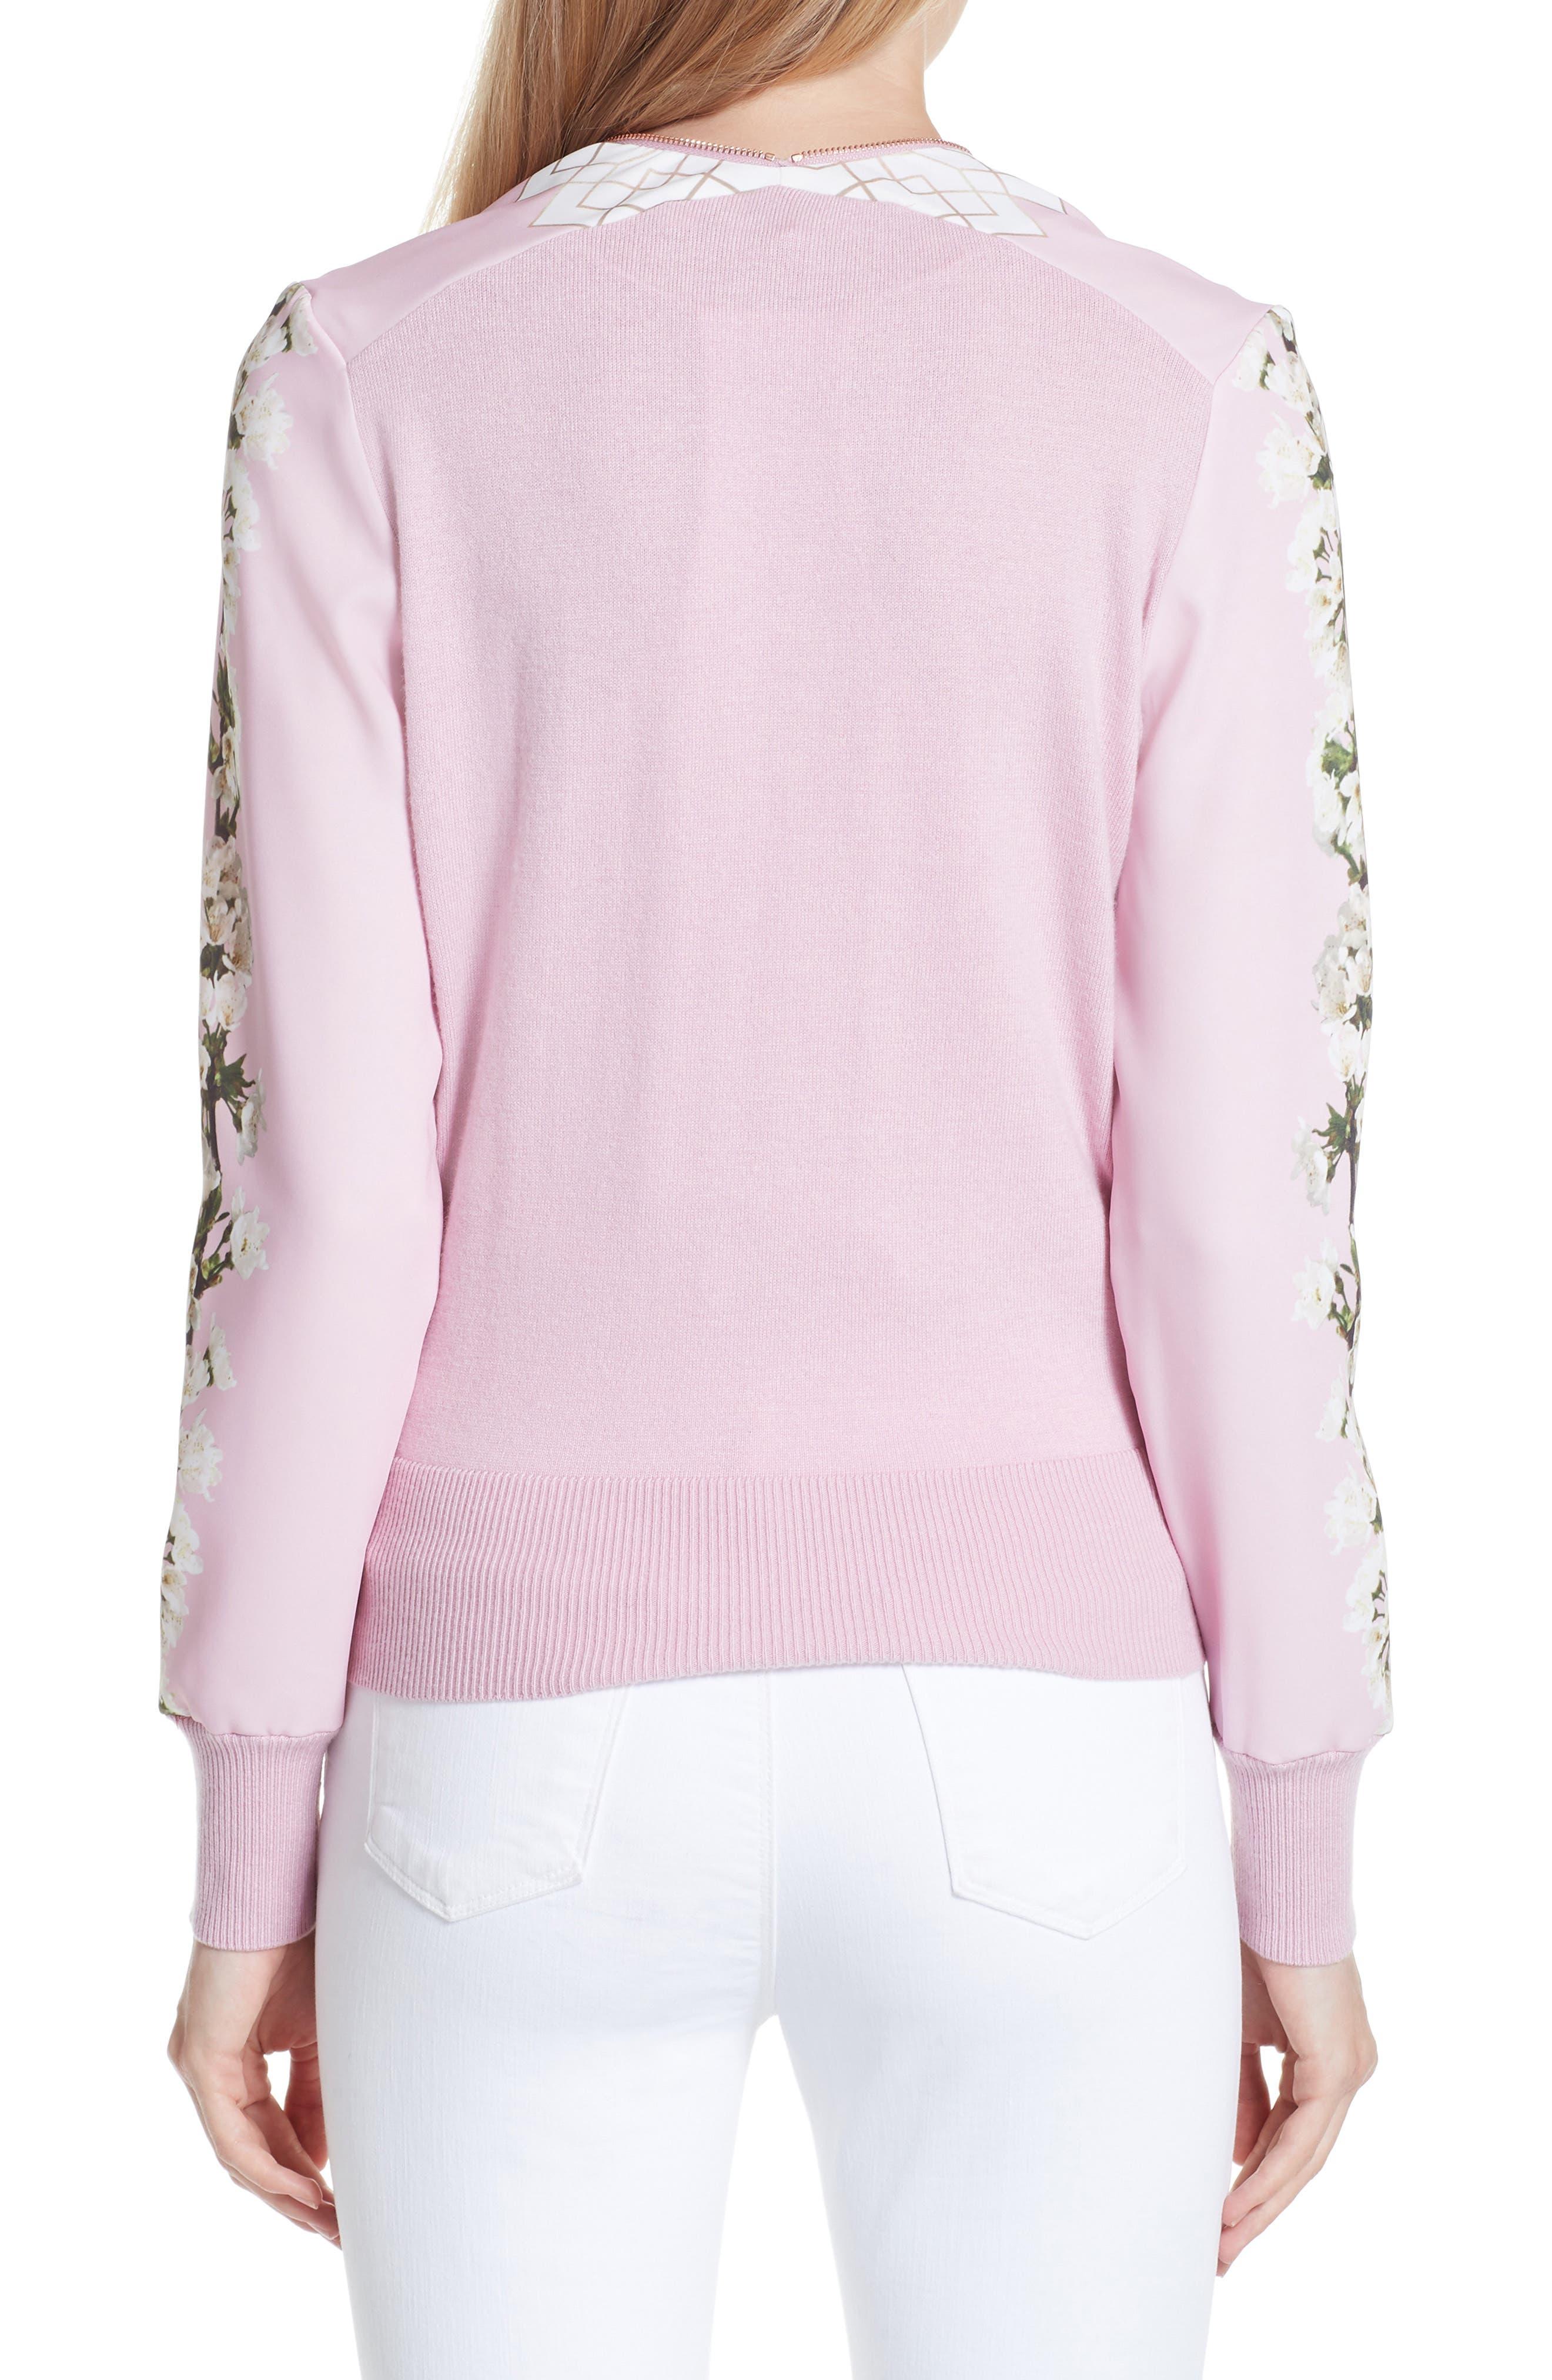 Emylou Harmony Bomber Jacket,                             Alternate thumbnail 2, color,                             Pale Pink